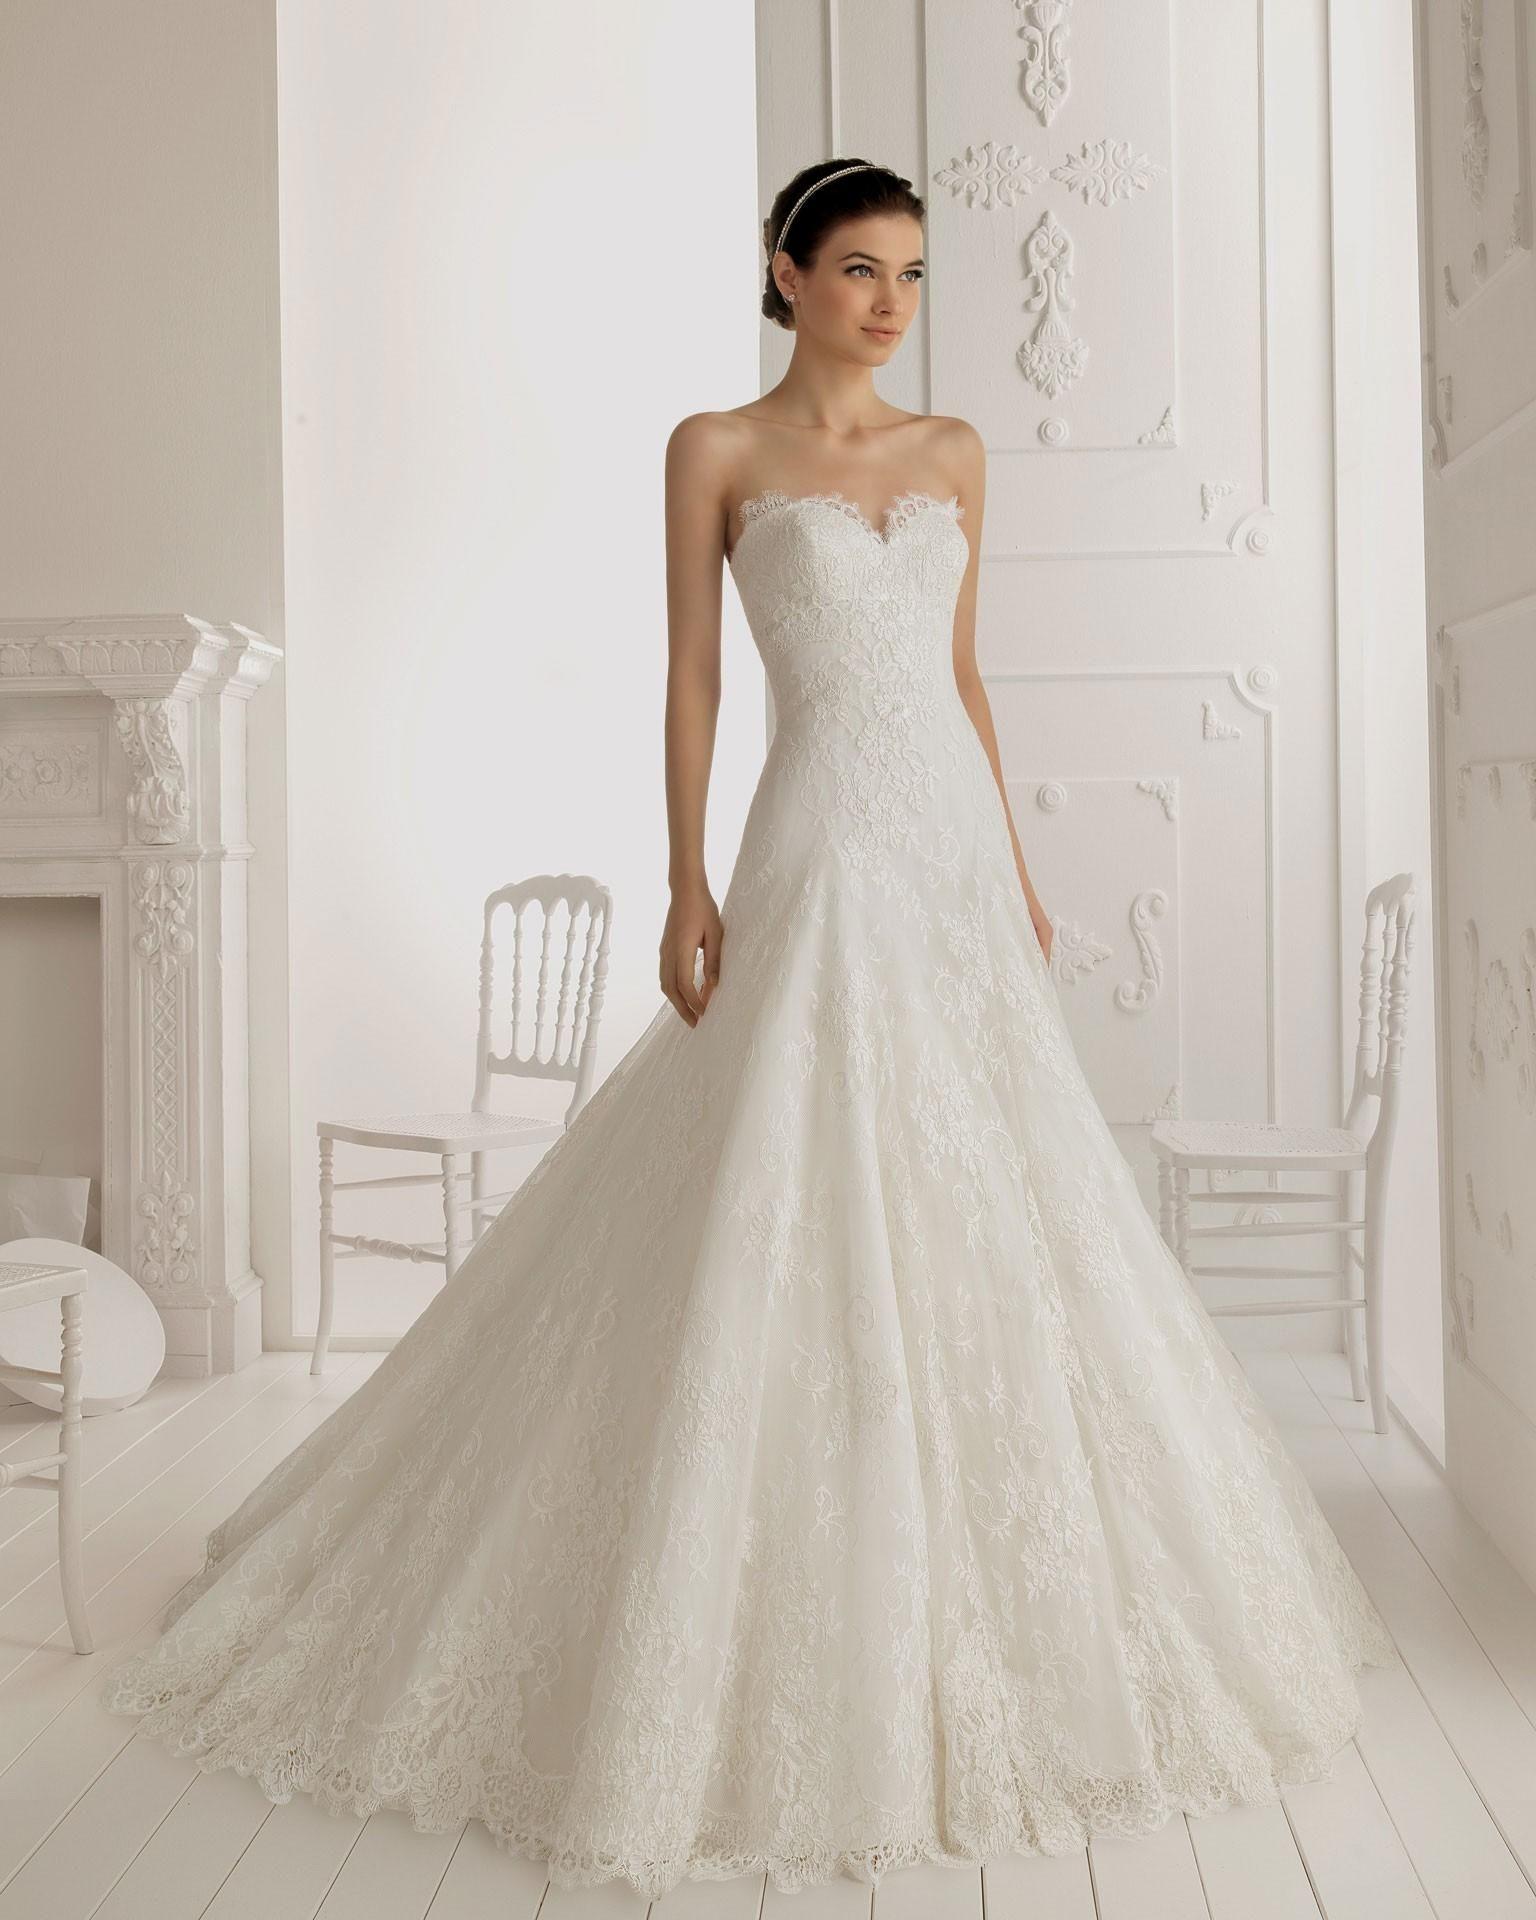 Pin By Jessica Tomaszewski On Wedding Ideas | Pinterest | Drop Waist, Wedding  Dress And Weddings